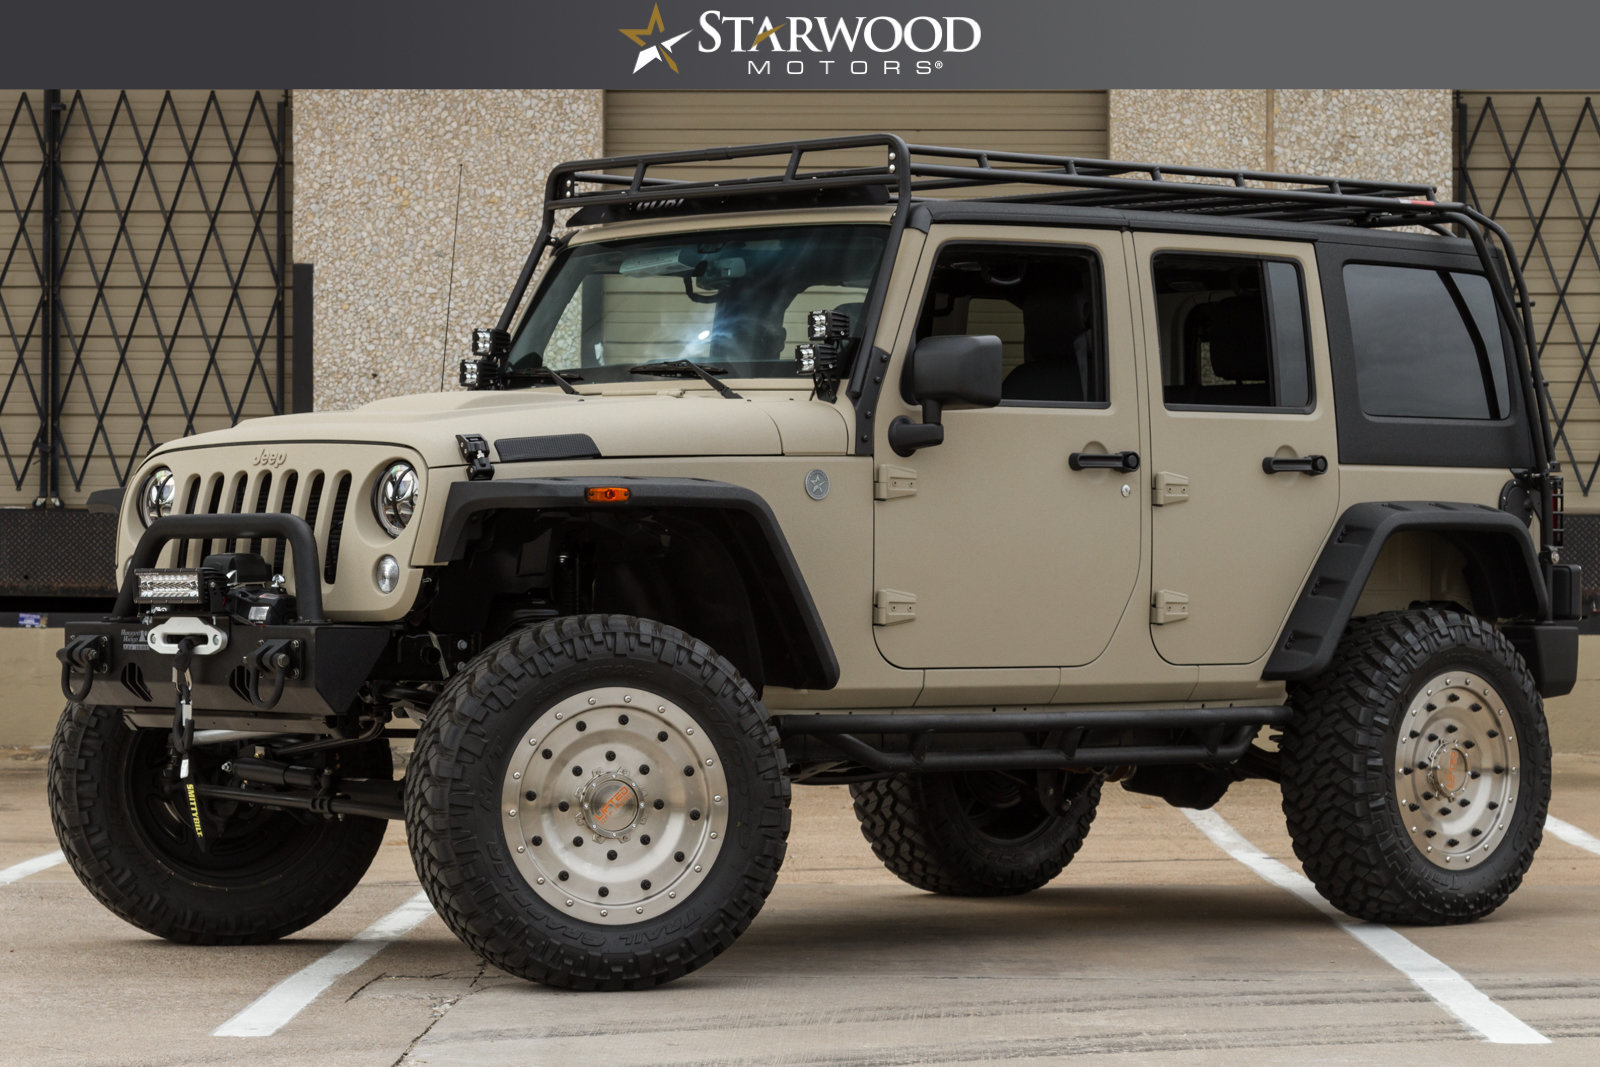 237058becbaae hd 2017 jeep wrangler unlimited sport